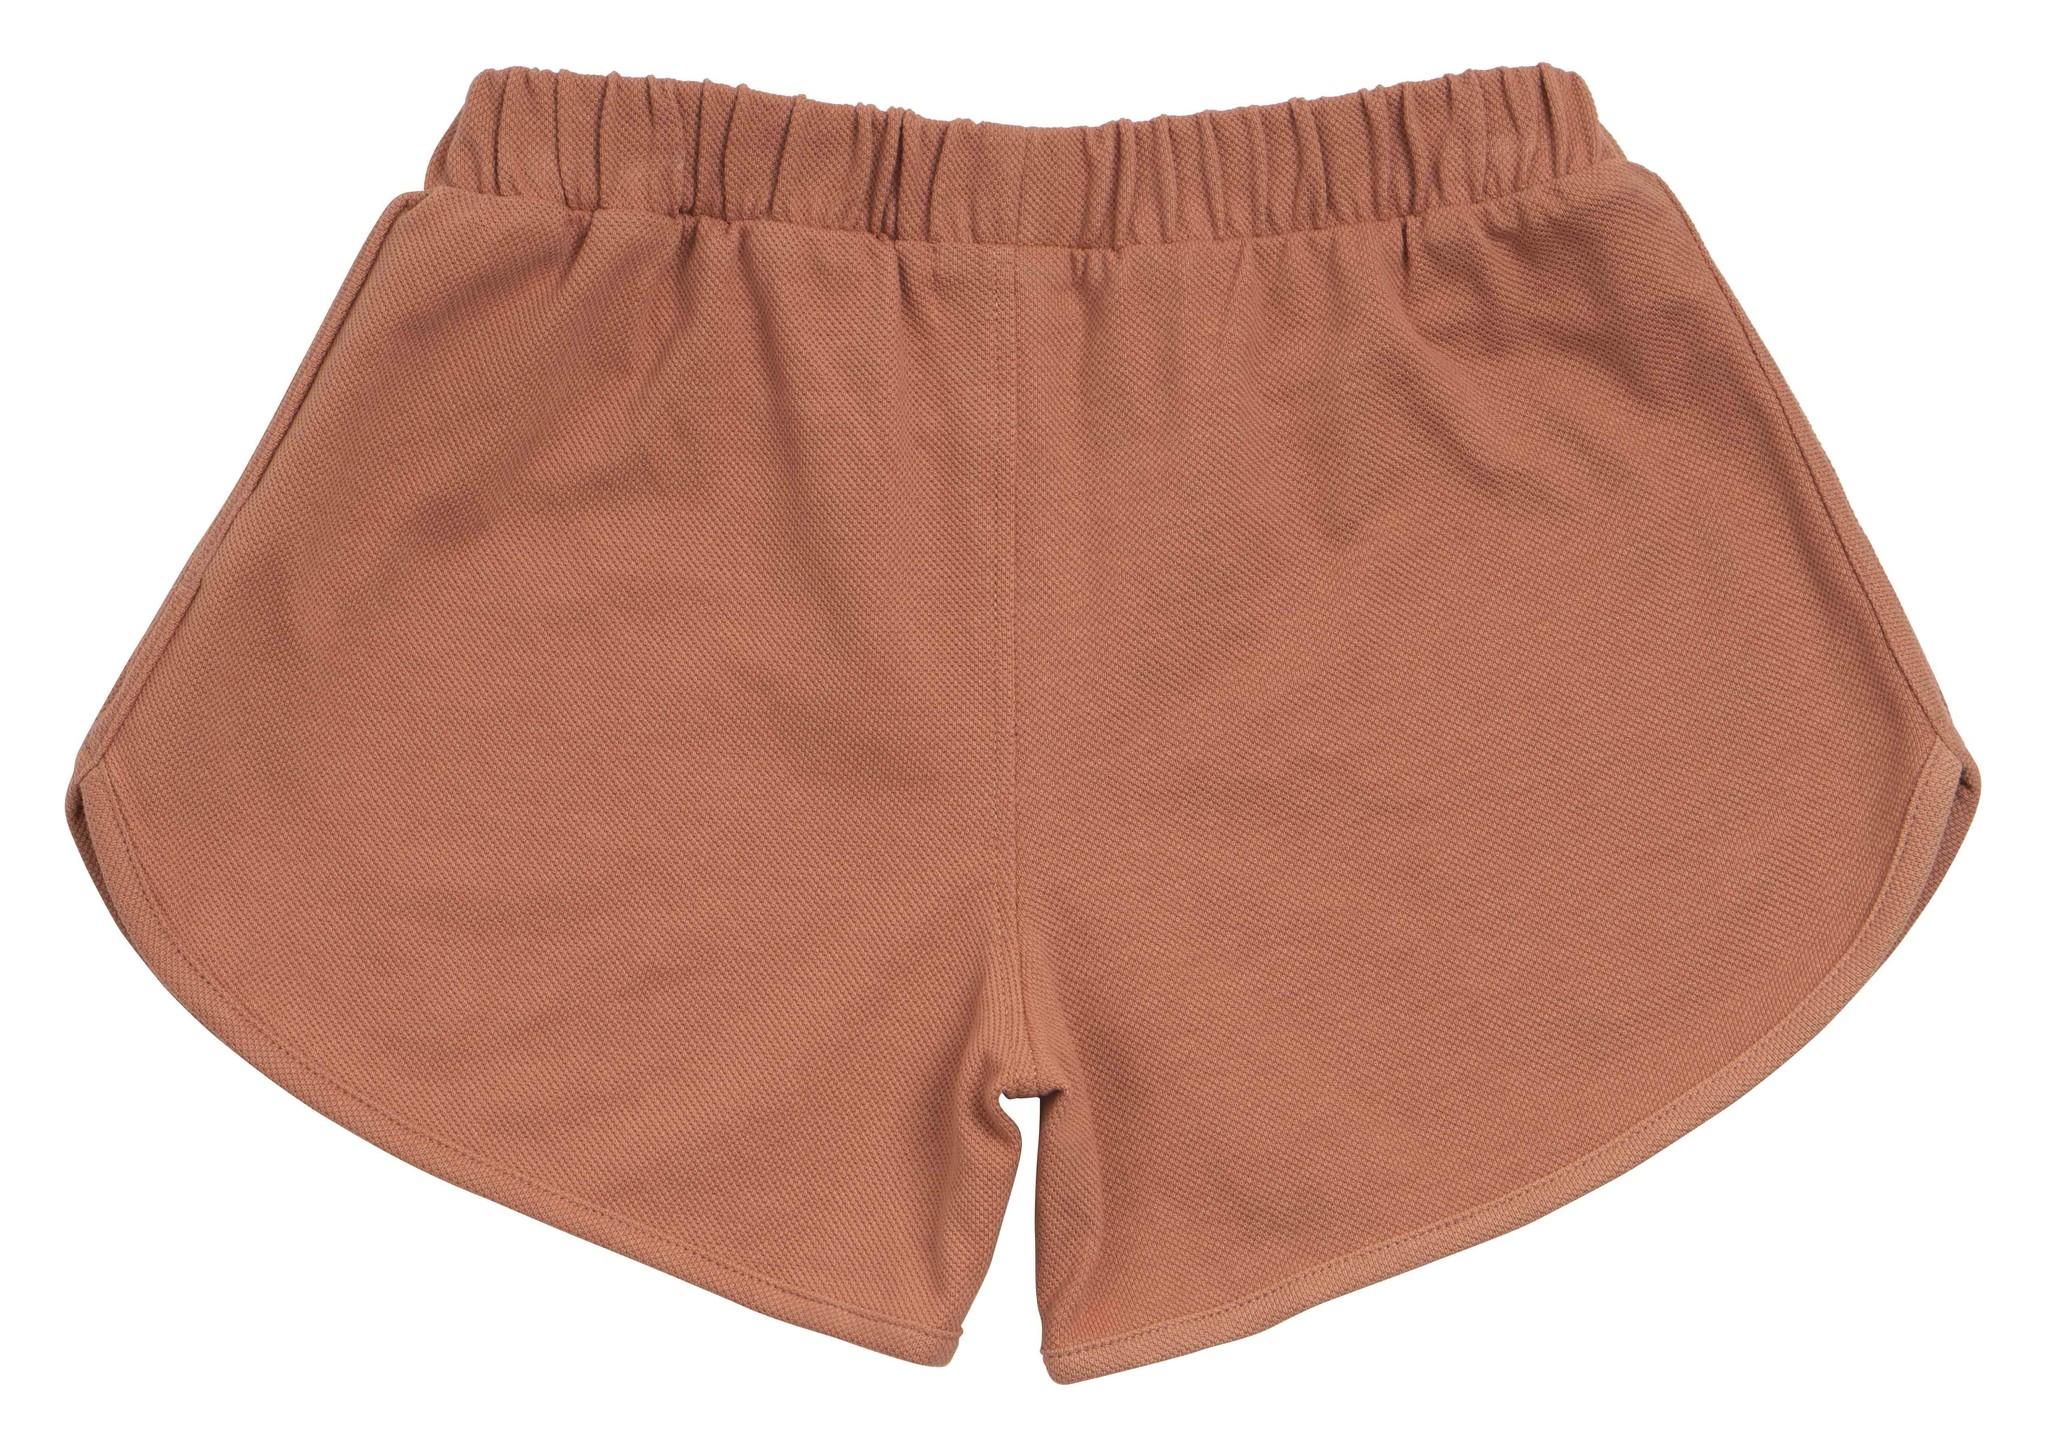 Minimalisma shorts ELSPA- 100% organic  cotton - tan - 2 to 12 Y